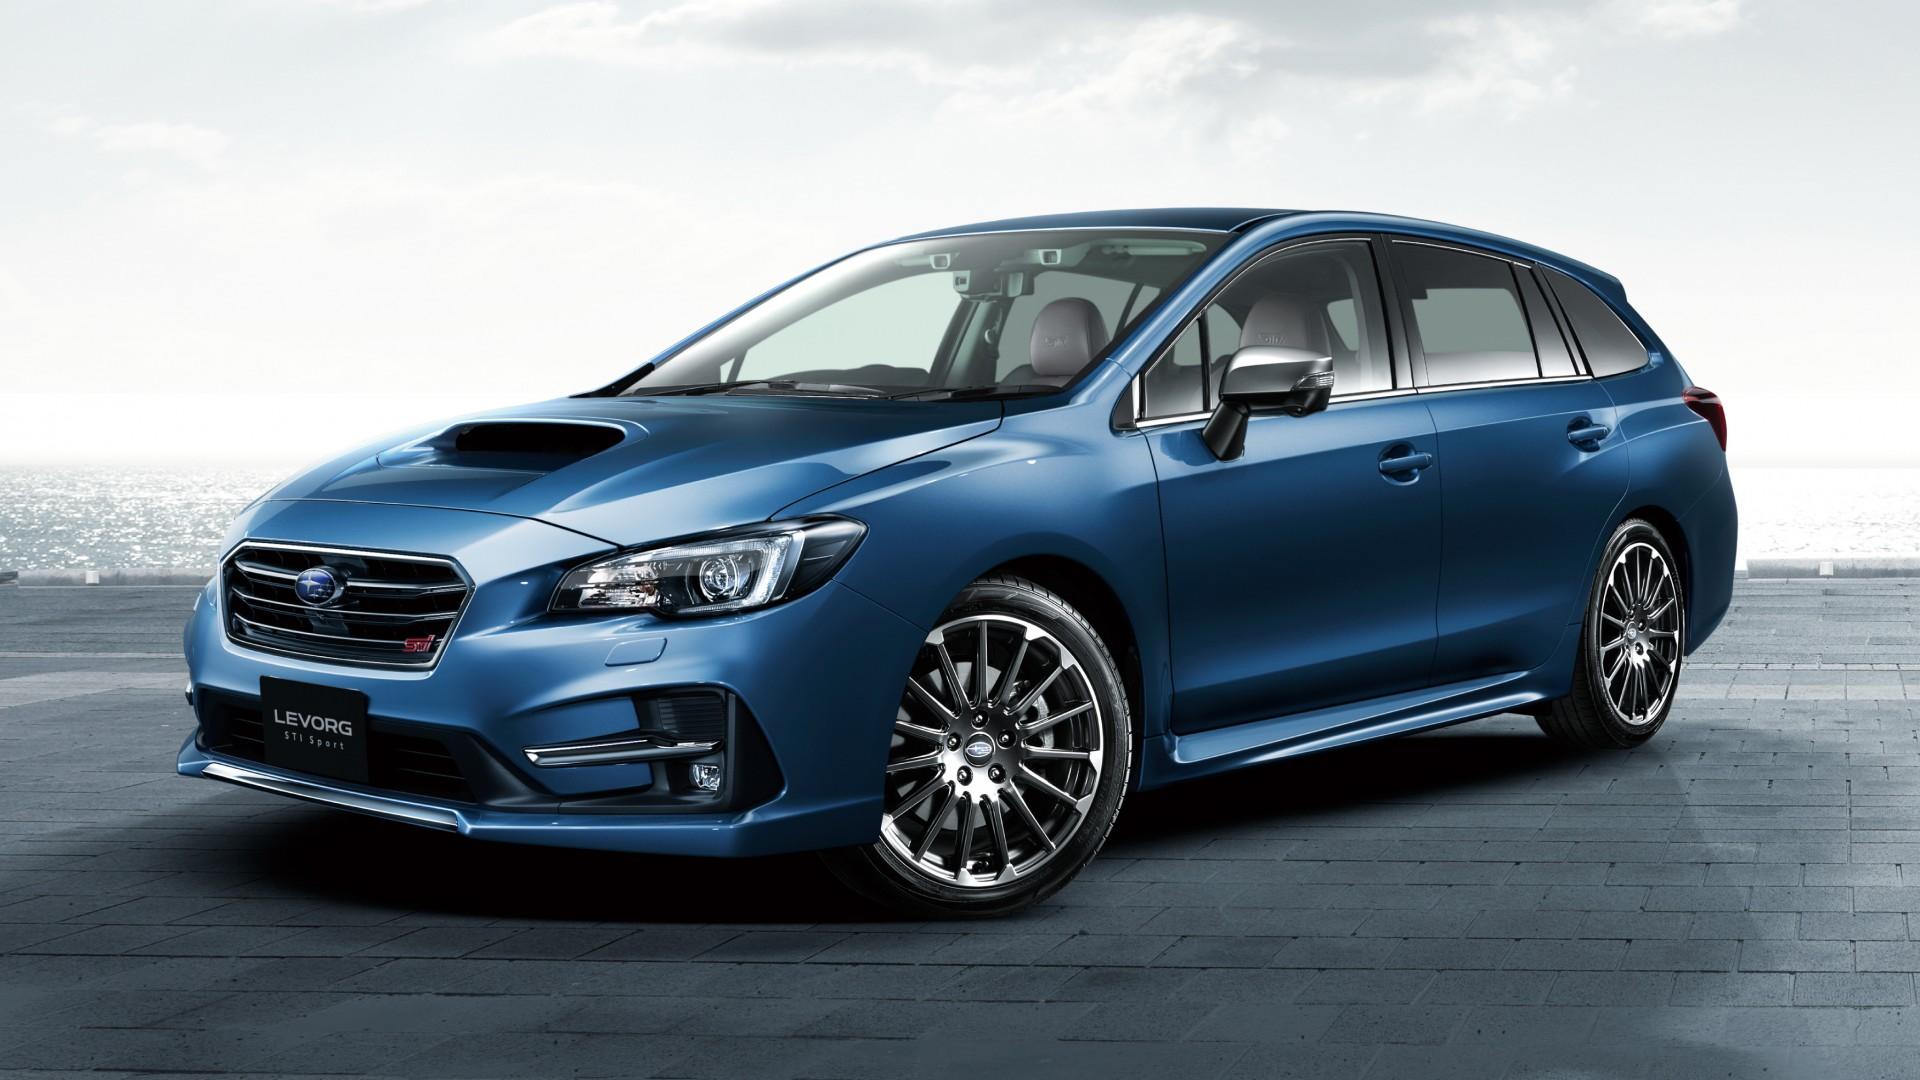 2017 Subaru Levorg Sti Sport Wallpaper Hd Car Wallpapers